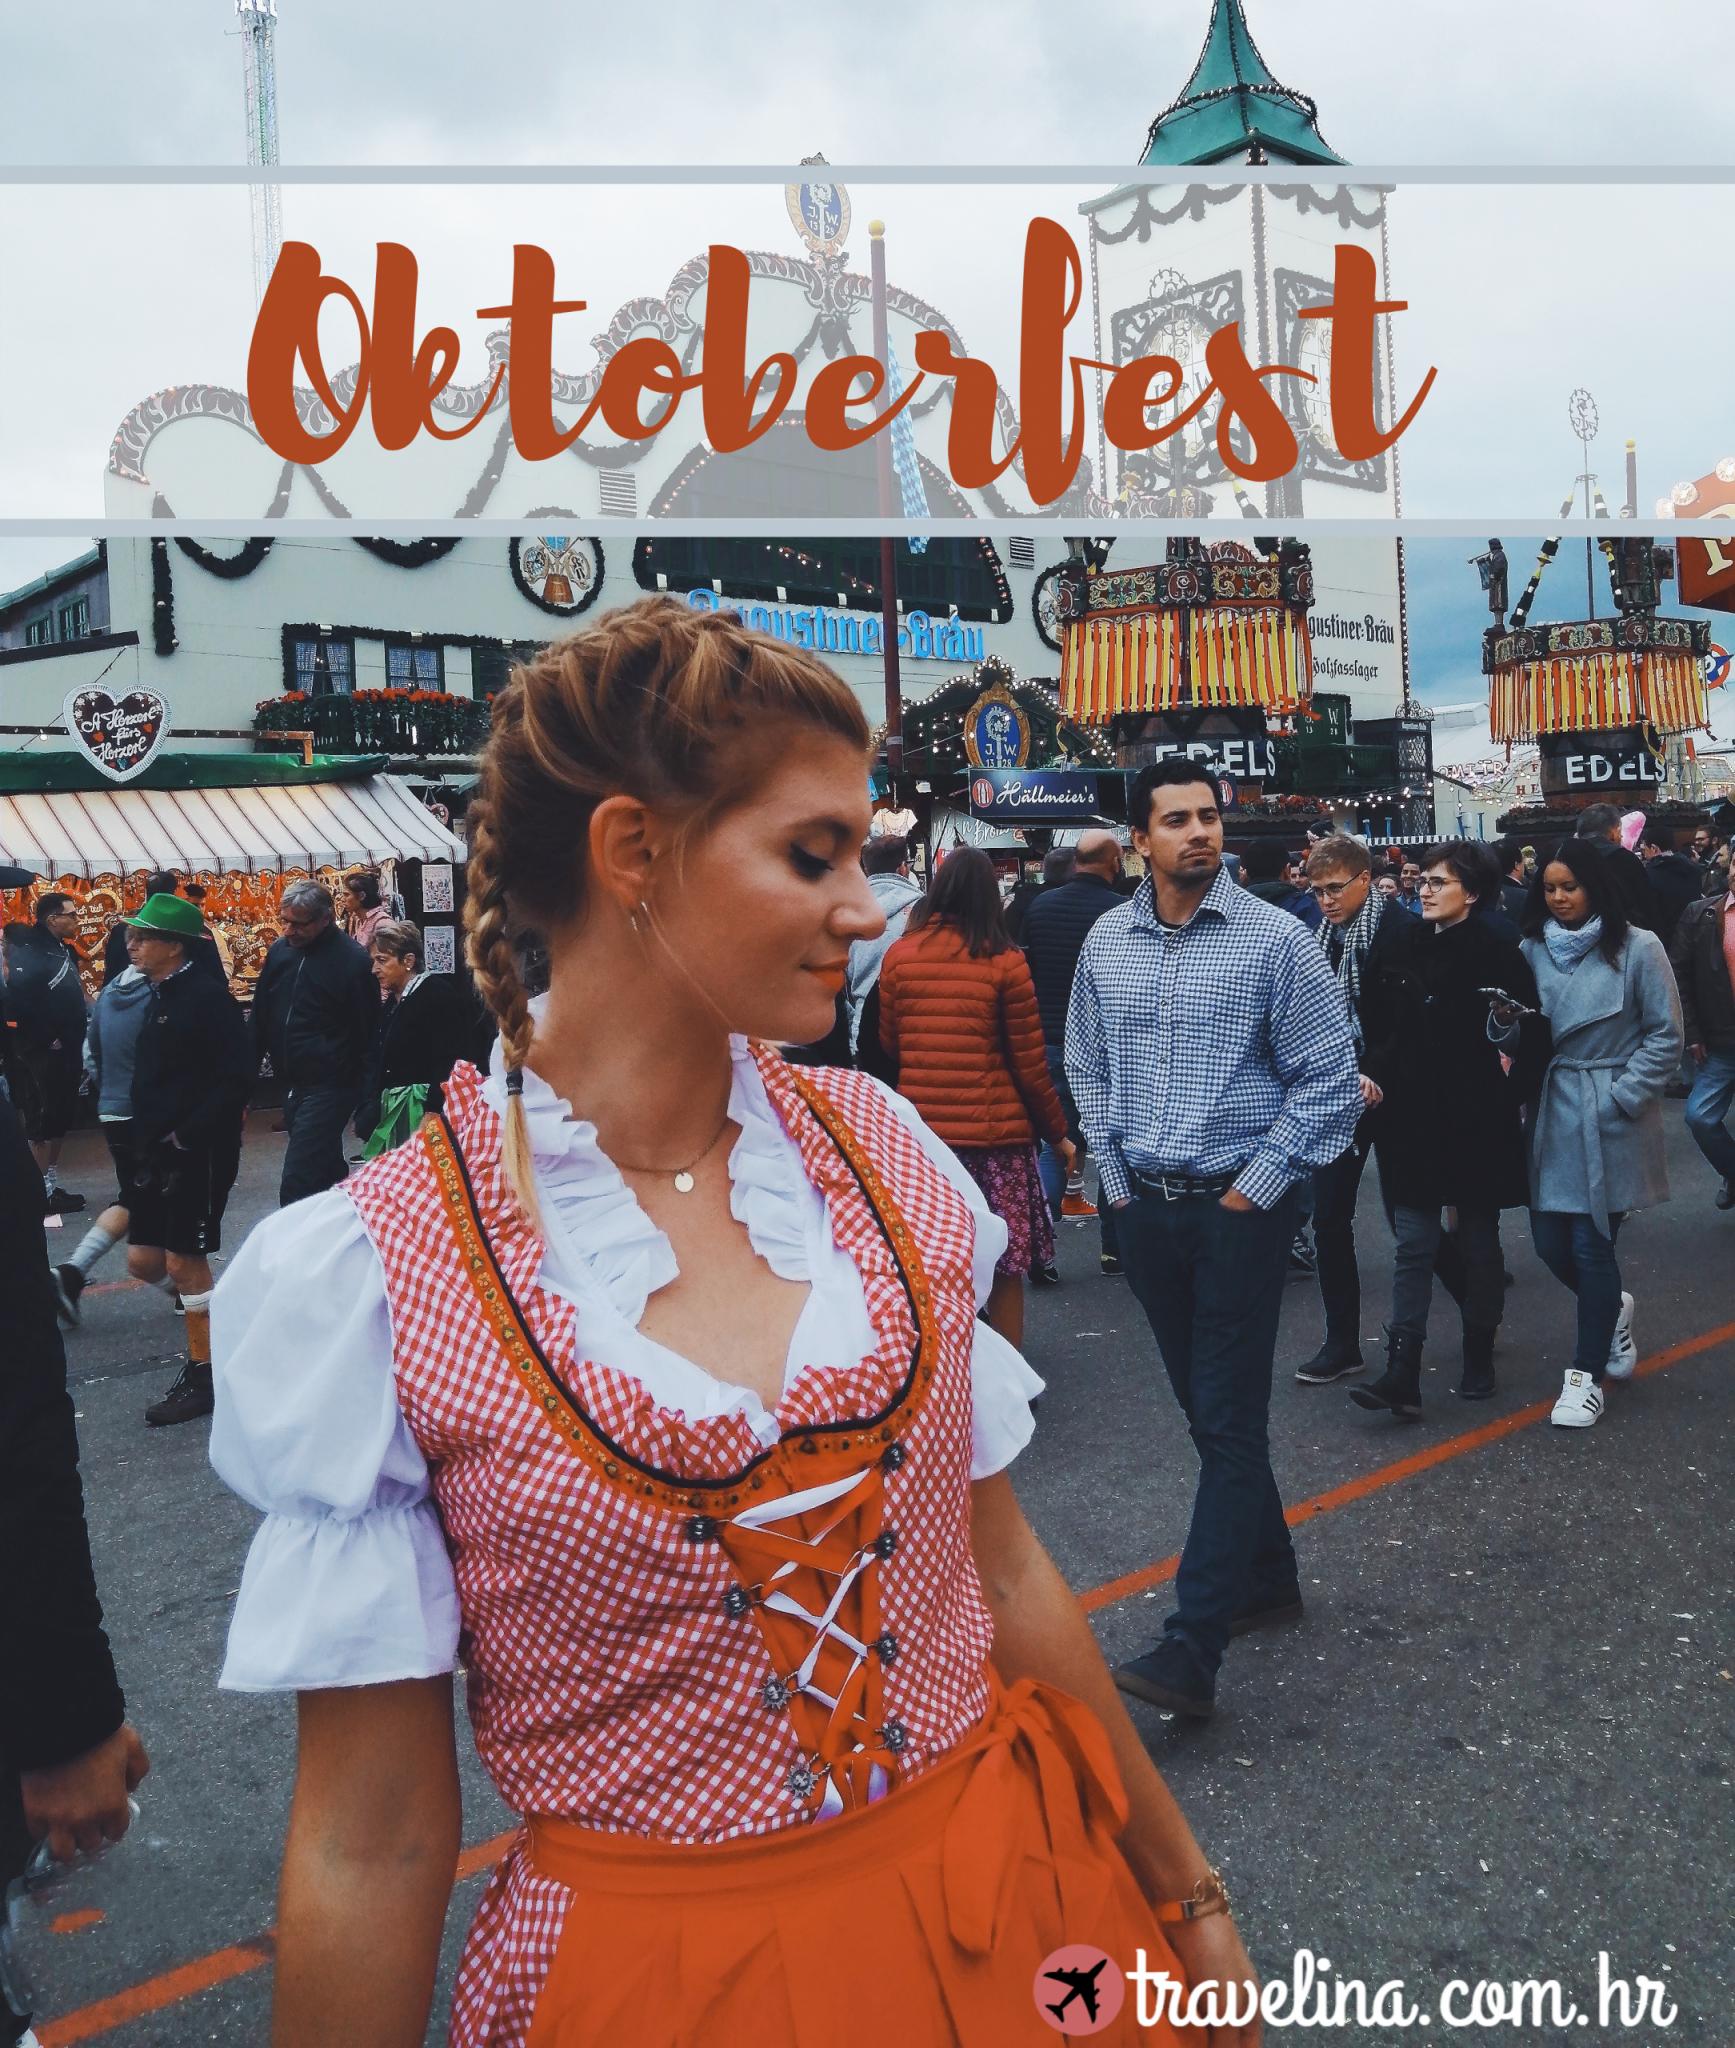 oktoberfest travelina kako doci stici slike influencer bloger blogger